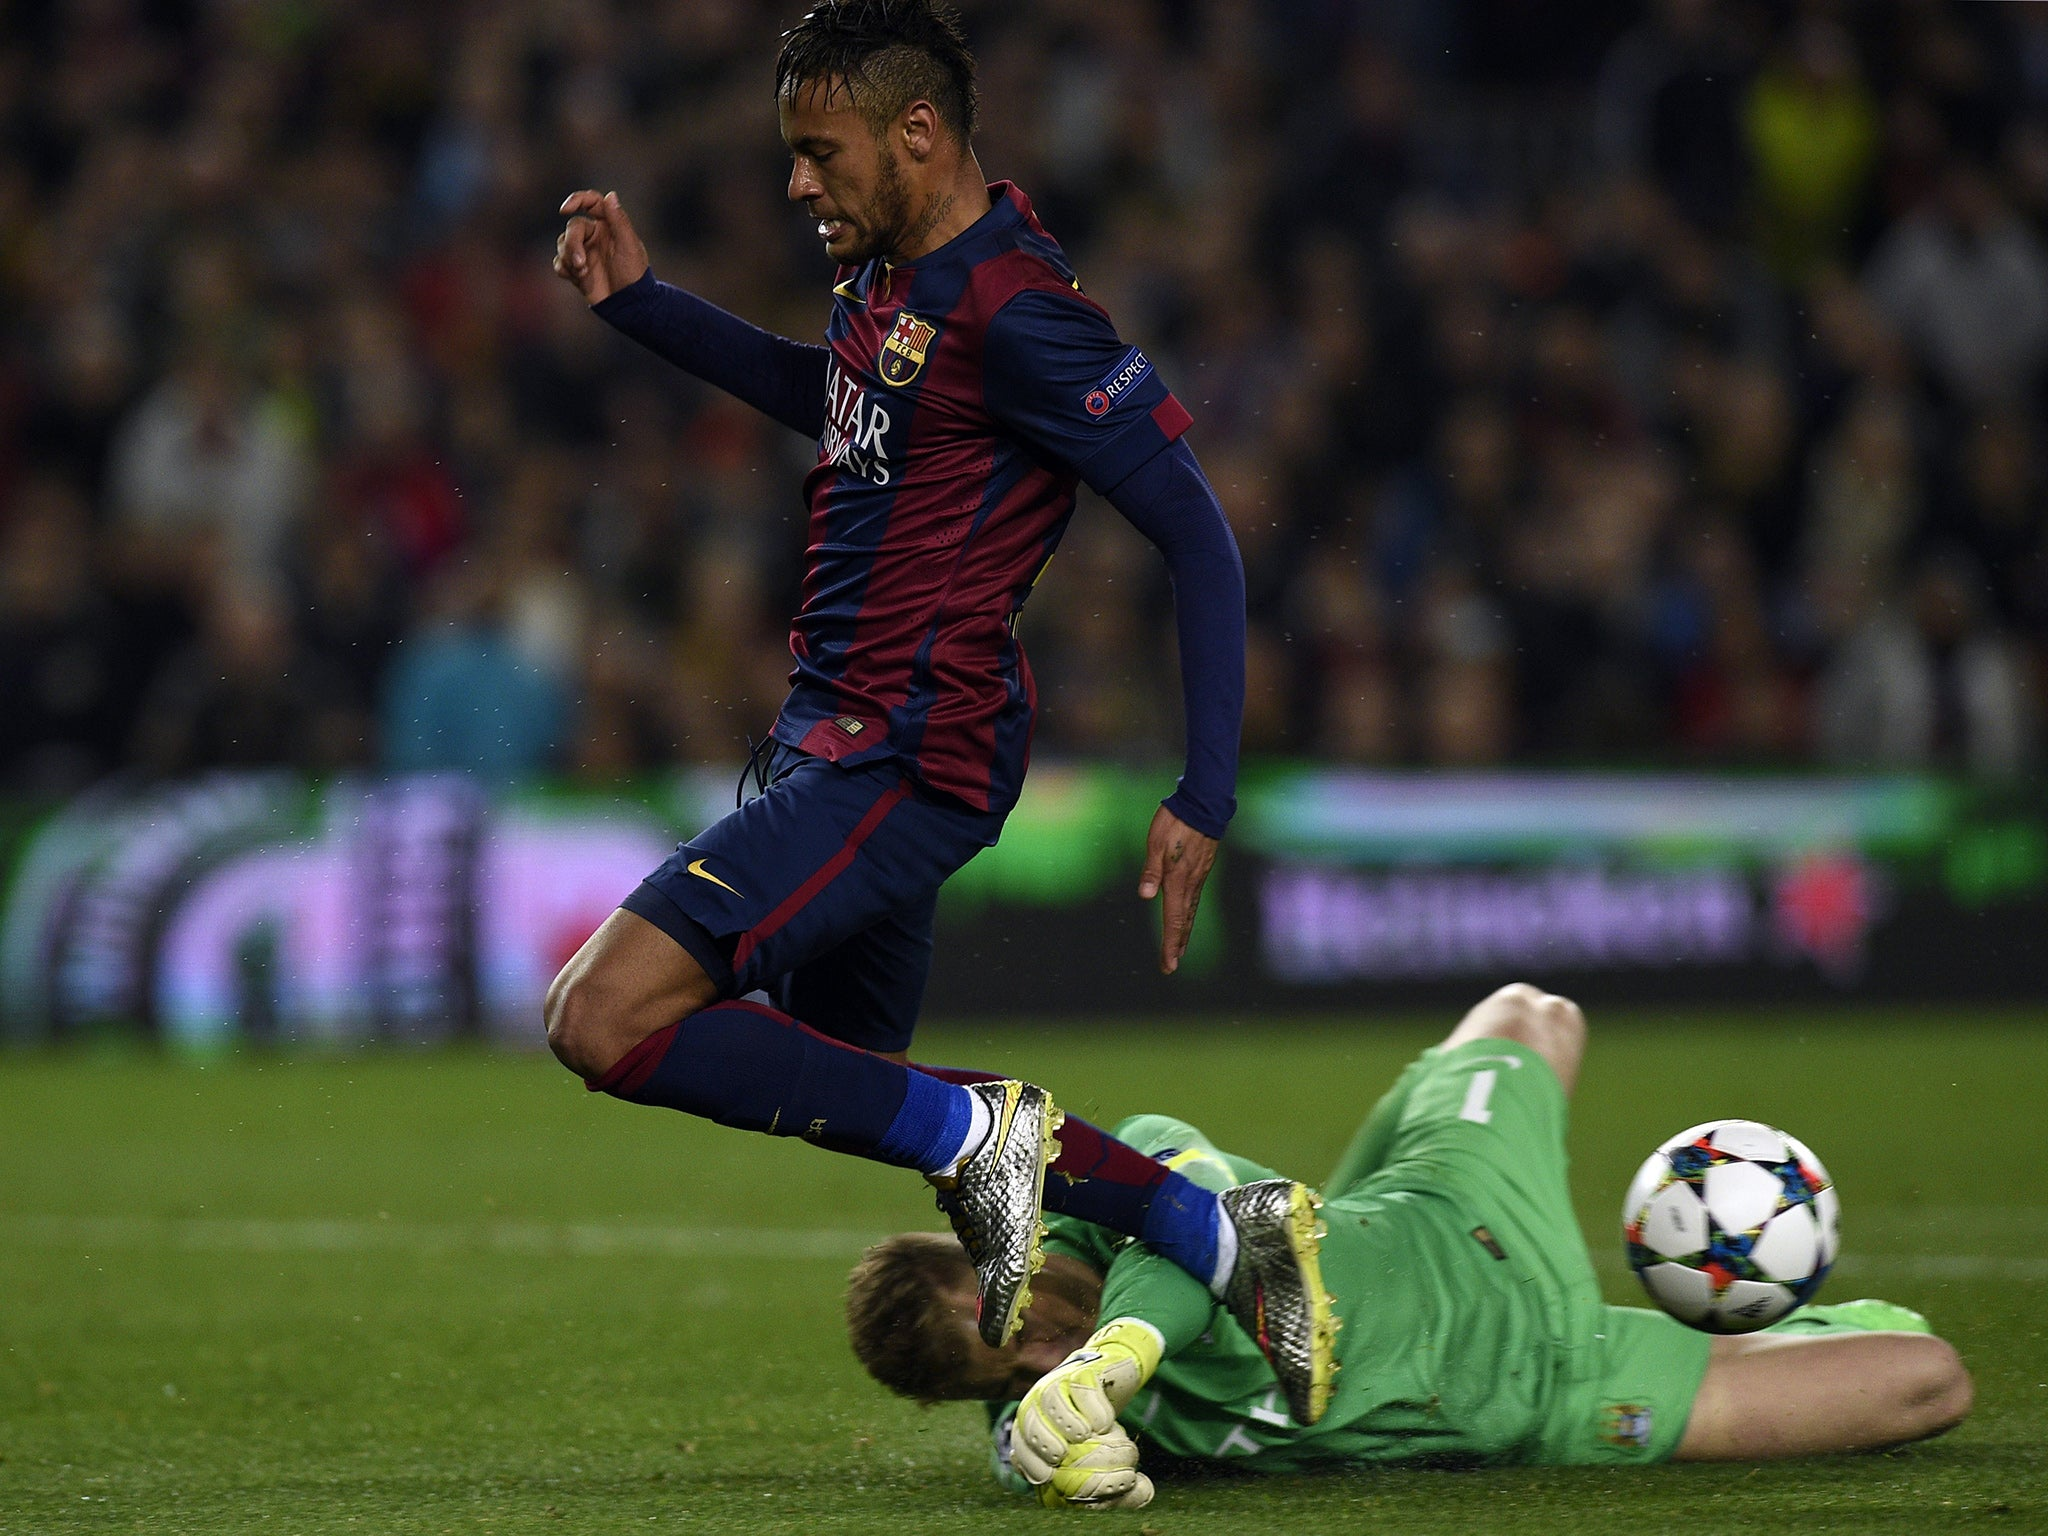 Barcelona Vs Man City Logo: Barcelona Vs Manchester City Player Ratings: Could Anyone